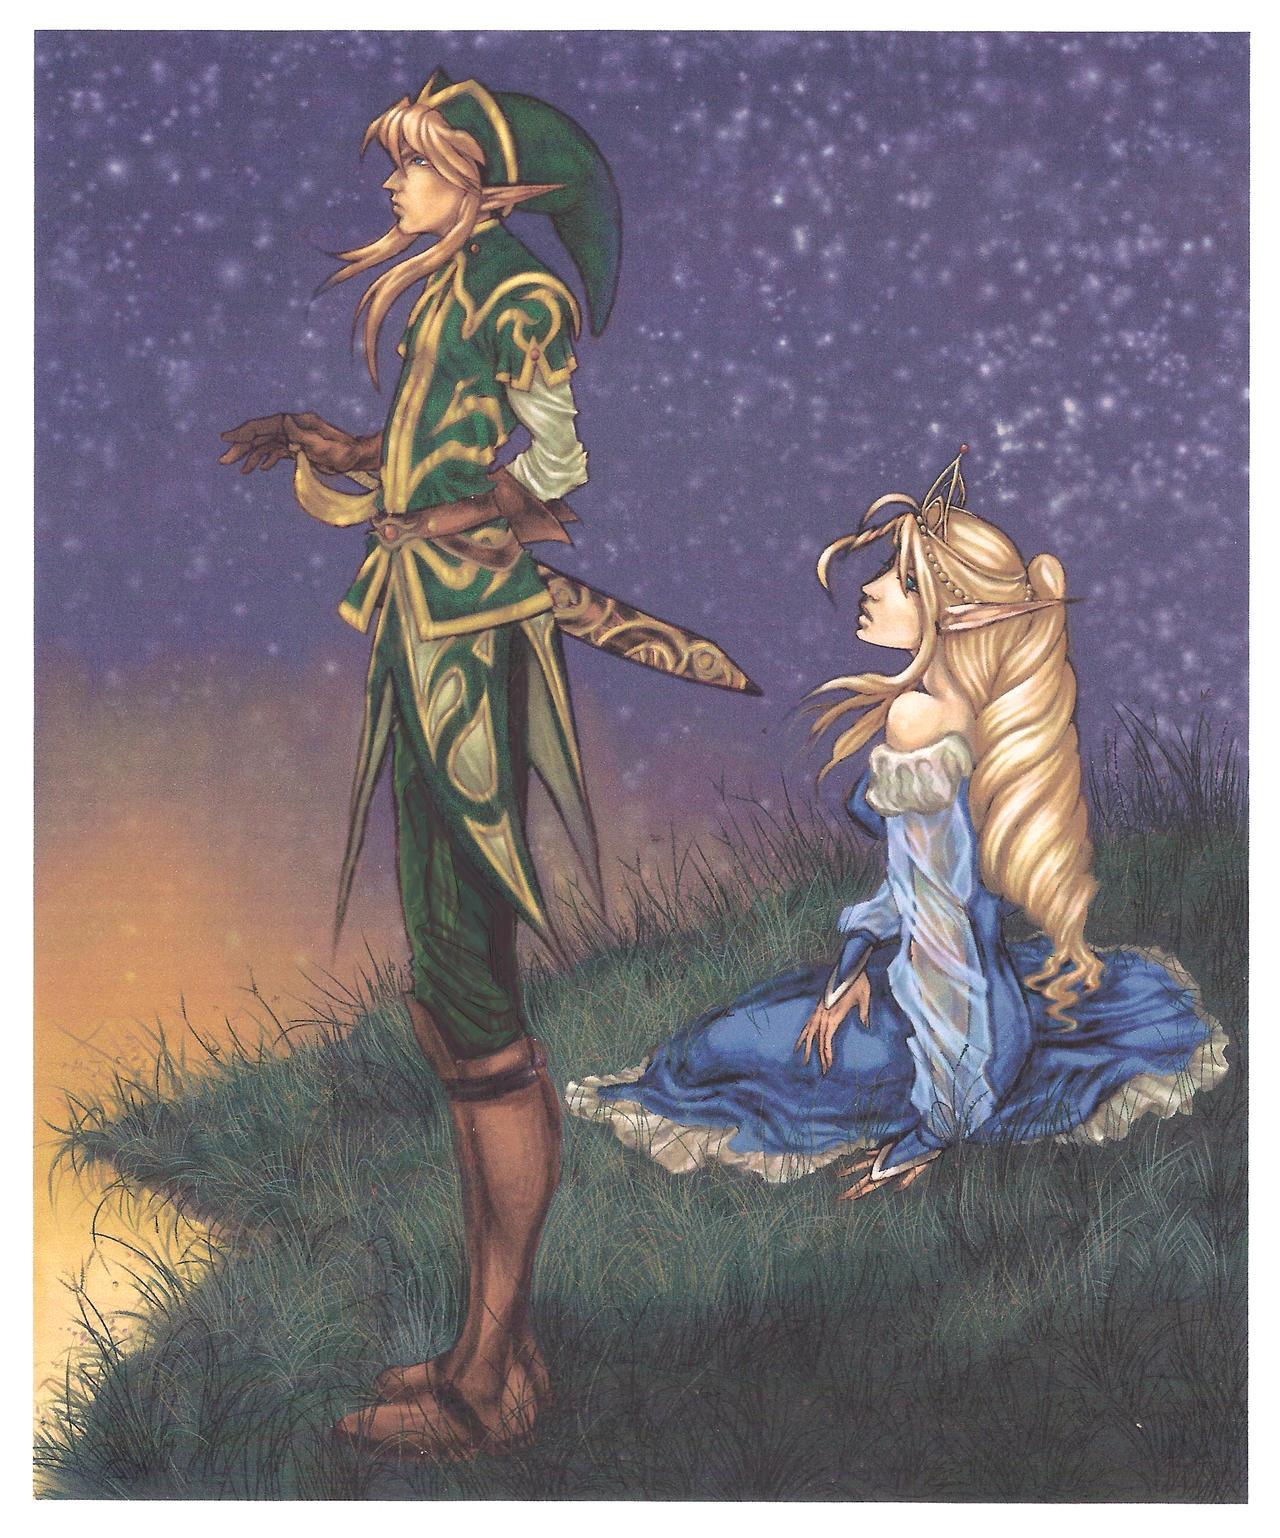 Zelda Forever Descargar Link And Zelda Forever By Beauregardtjangles Dojlx